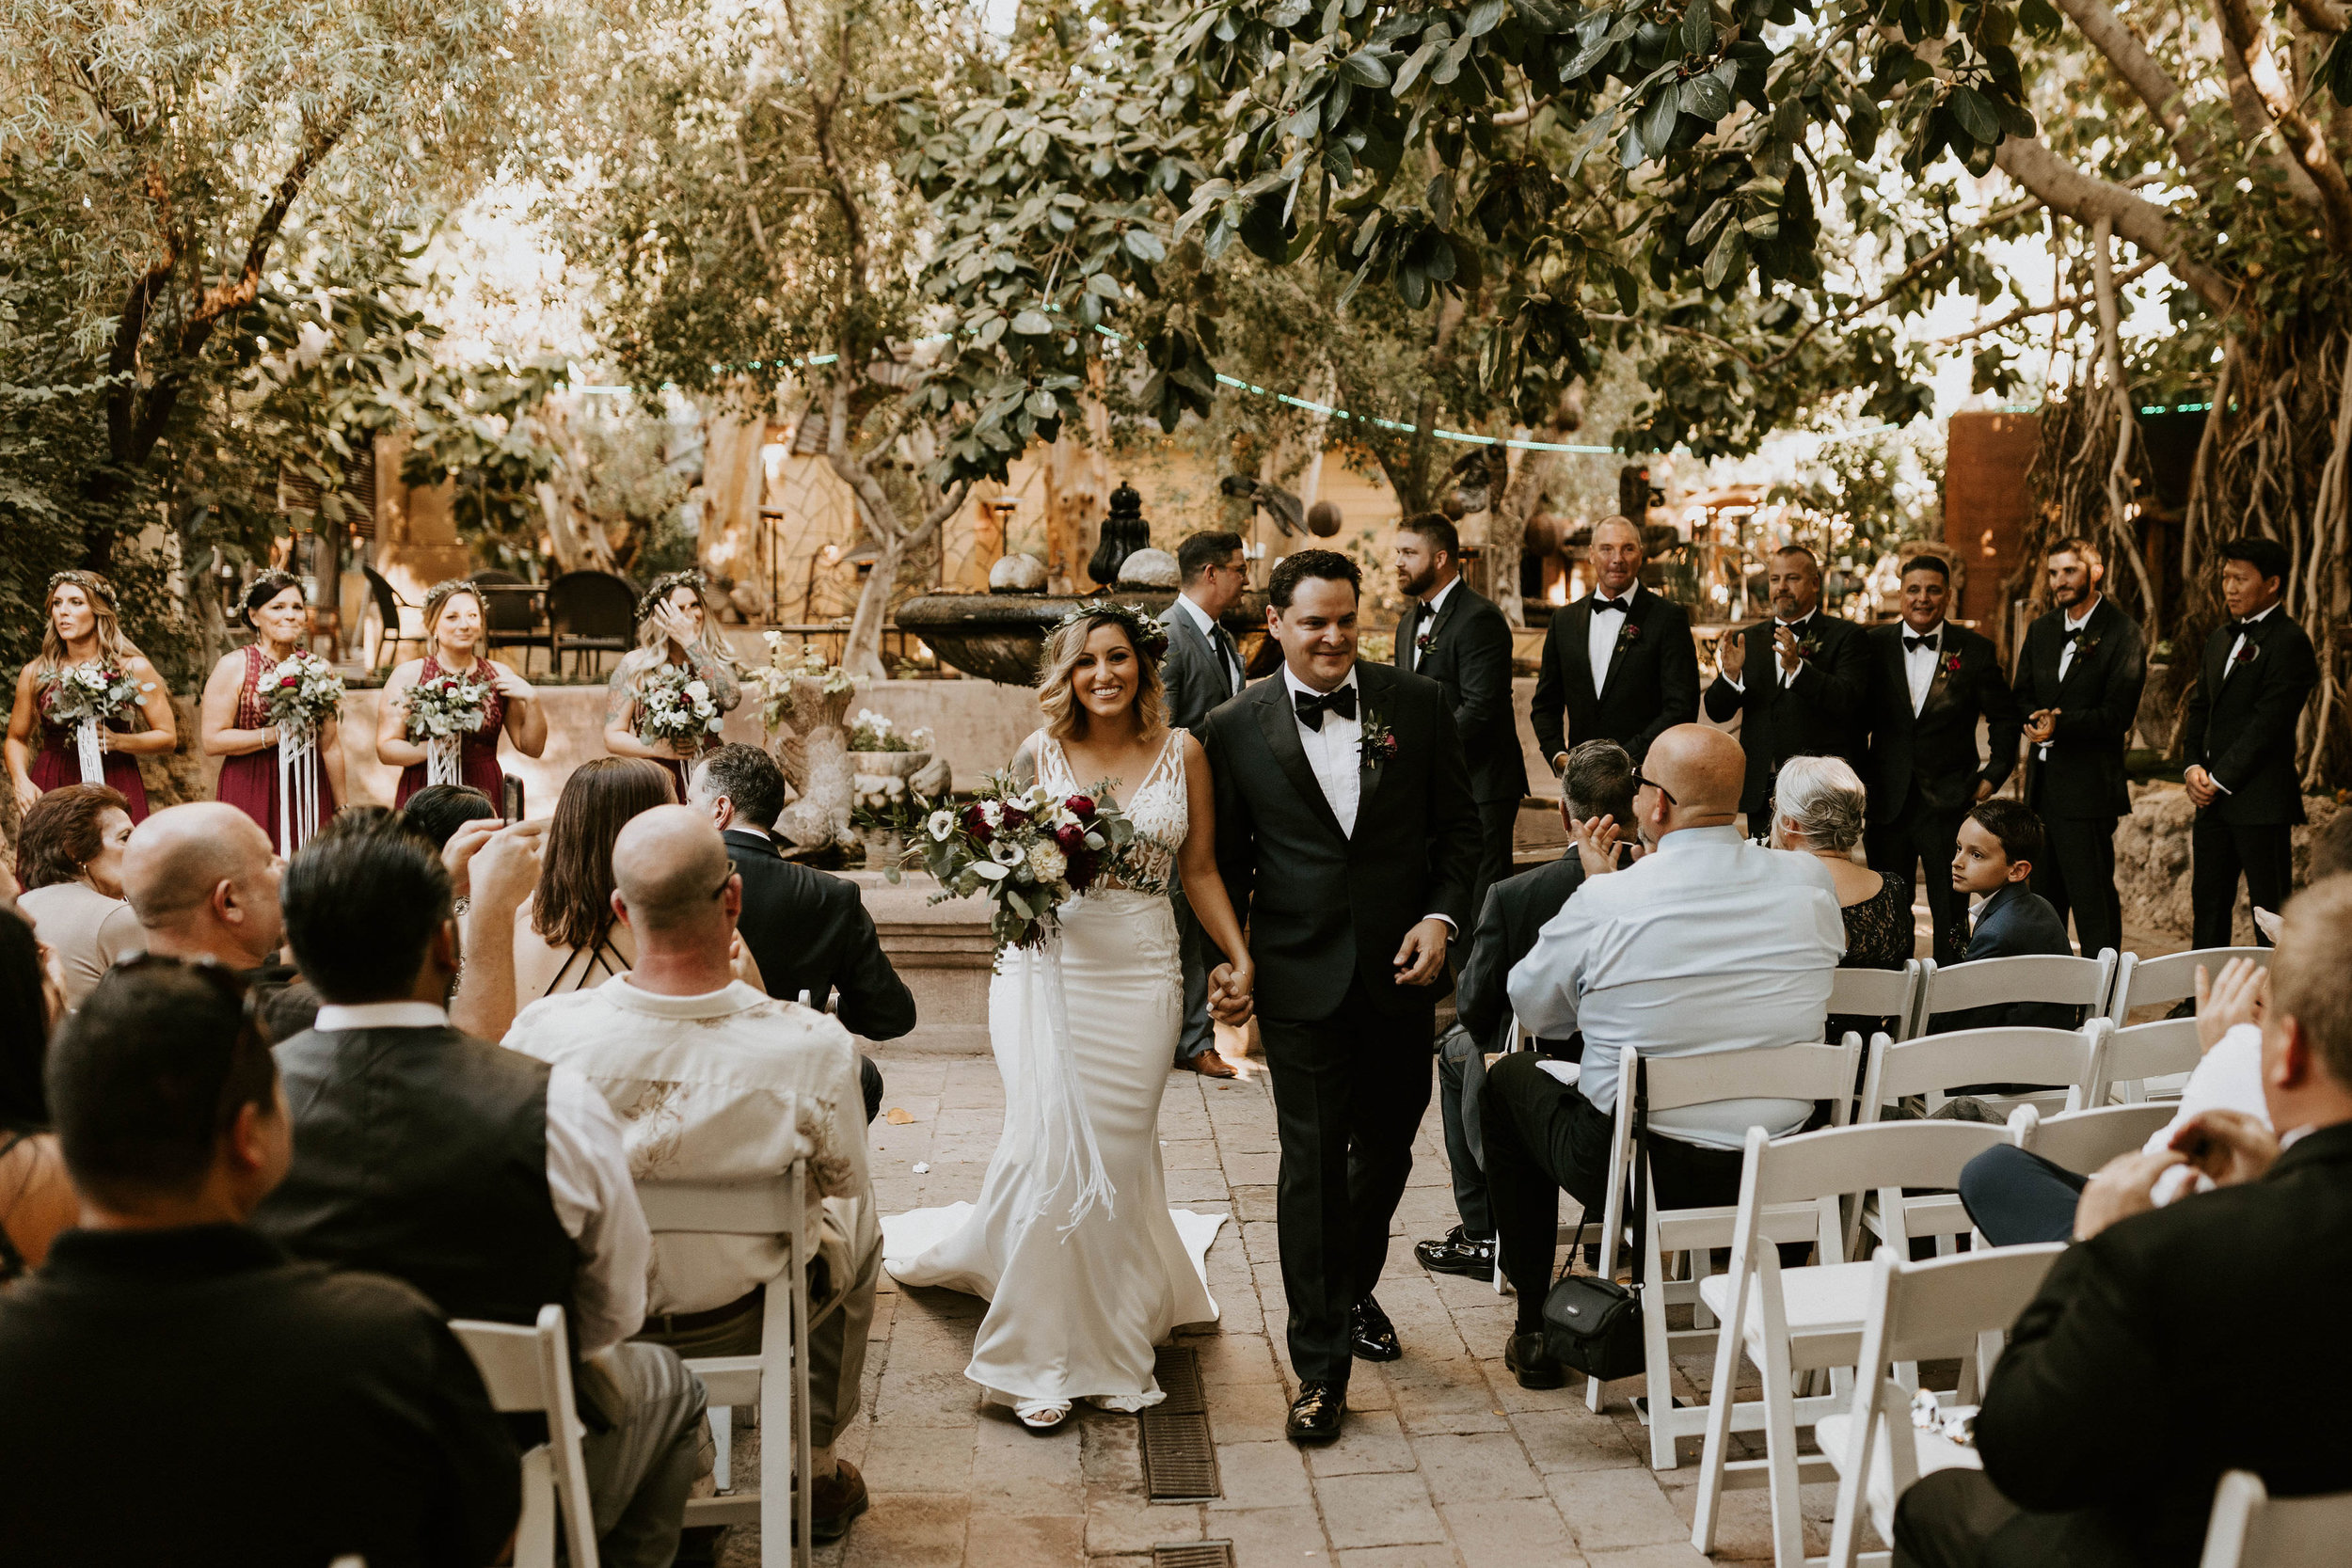 A wedding recessional at Boojum Tree